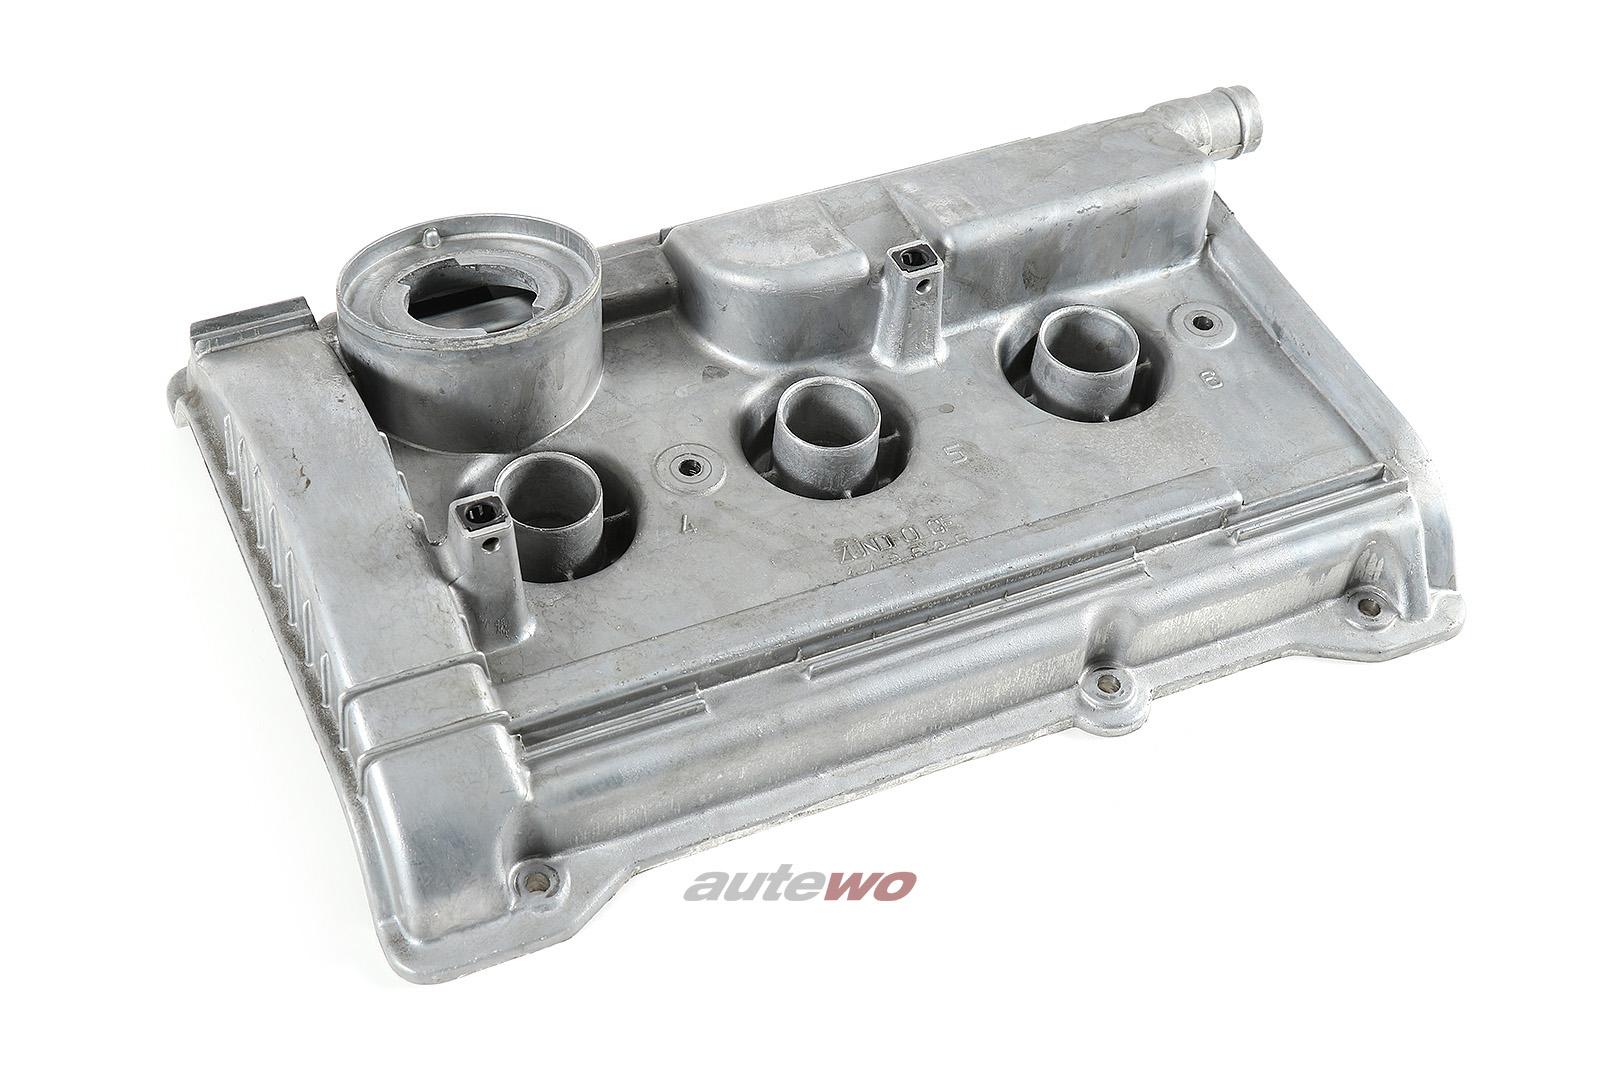 078103471L NEU Audi/VW A4 B5/A6 4B/A8 D2/Passat 3B V6 Ventildeckel Links